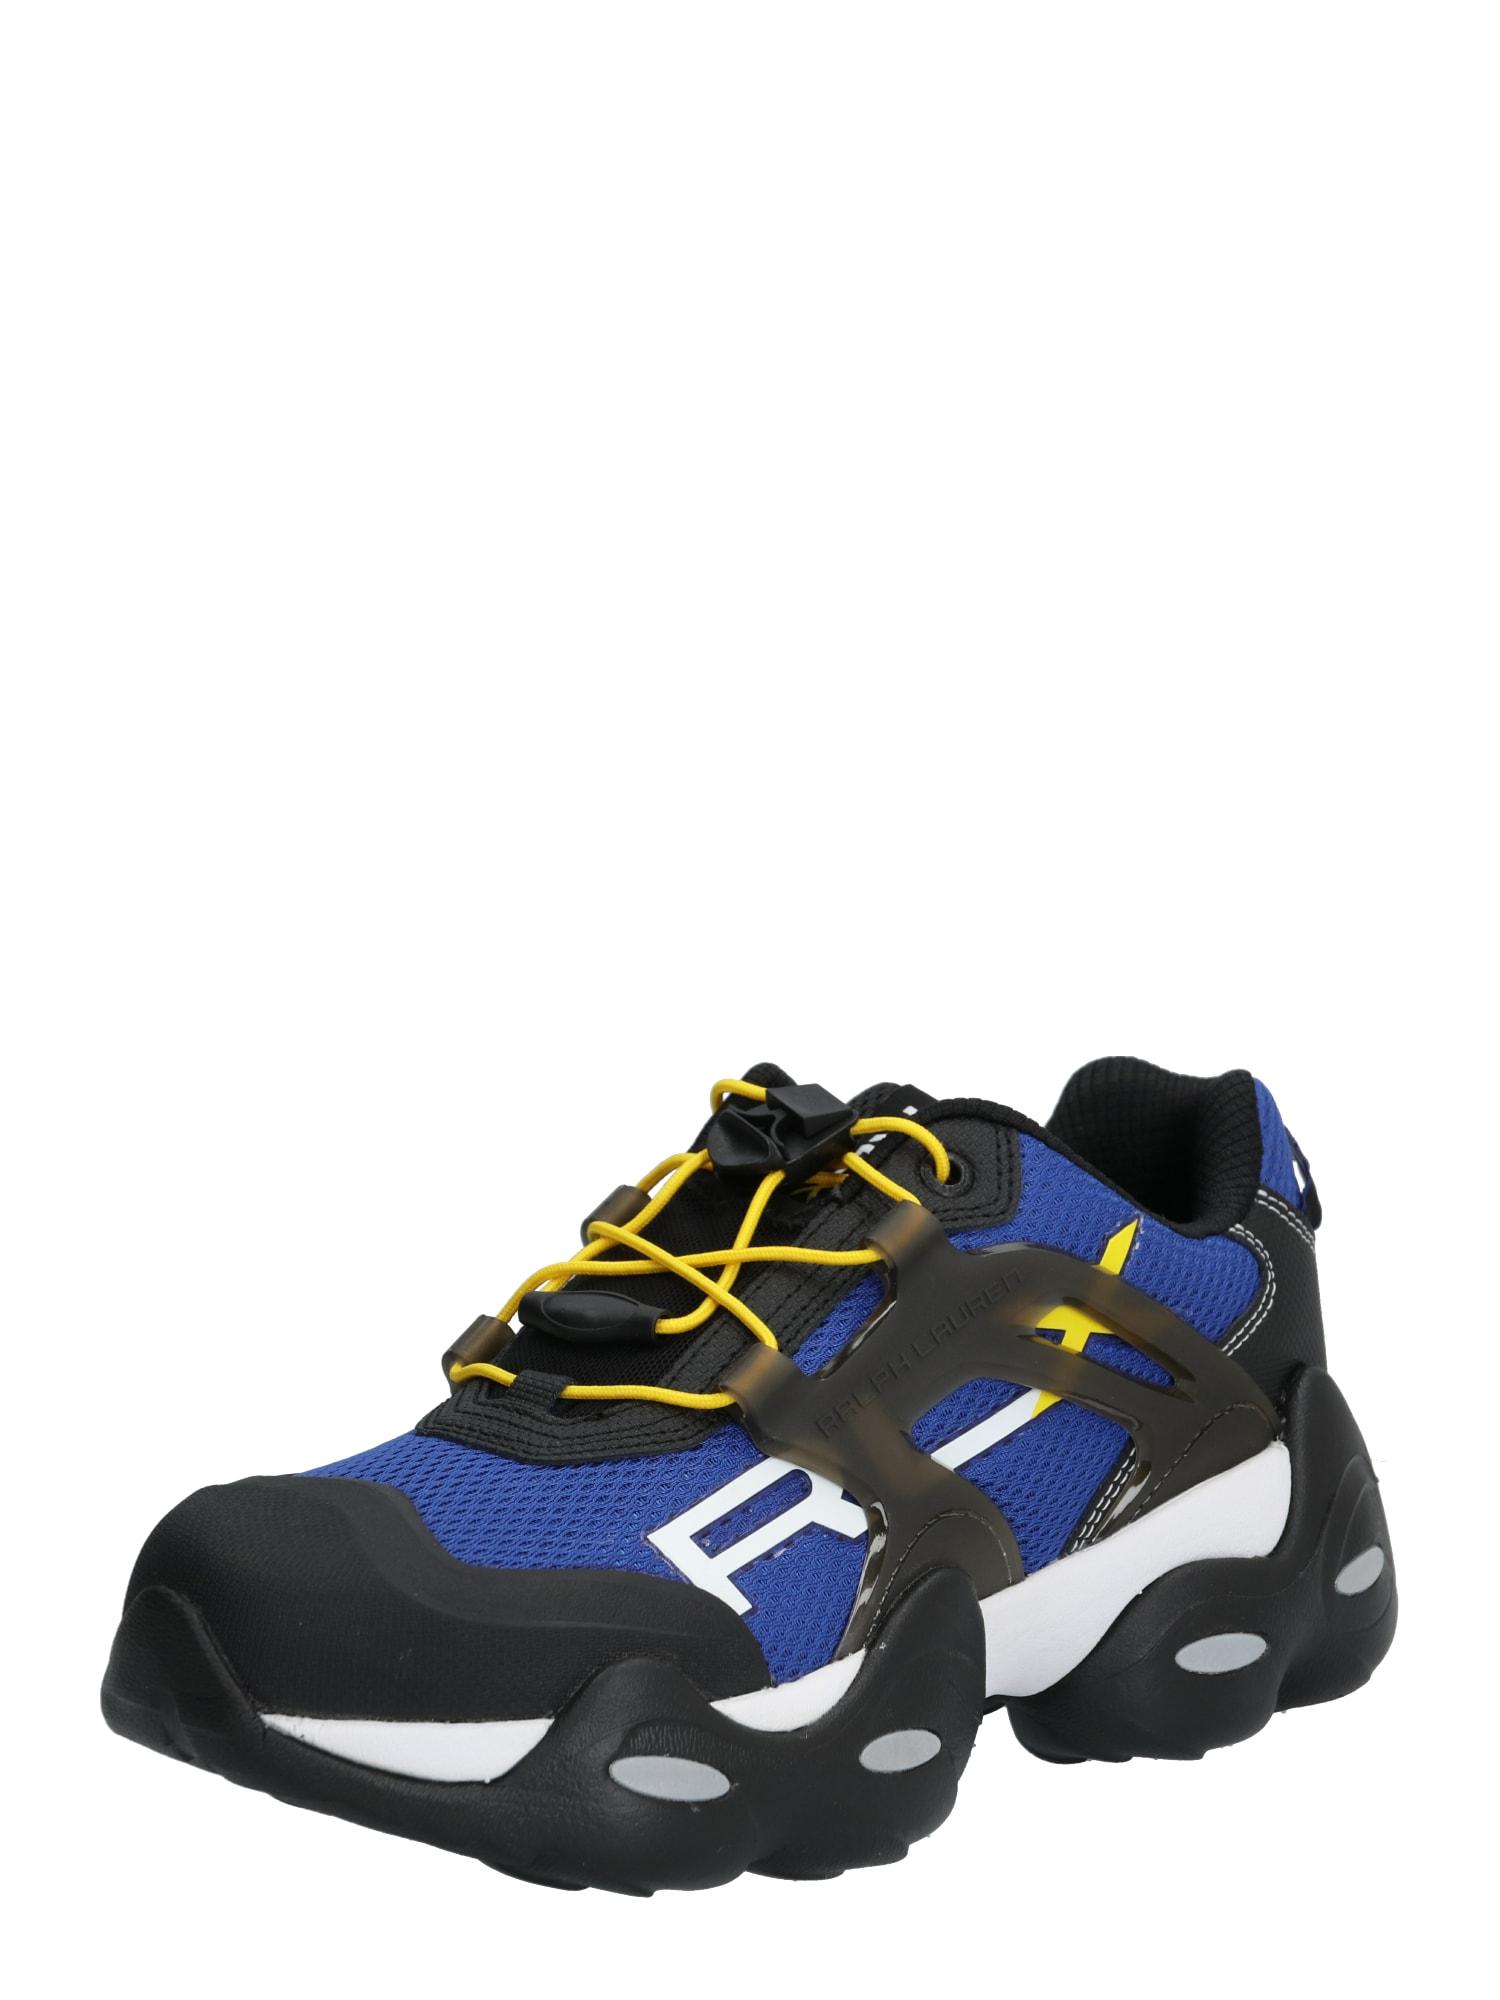 POLO RALPH LAUREN Sneaker low 'RLX TECH-SNEAKERS ATHLETIC'  albastru royal / negru